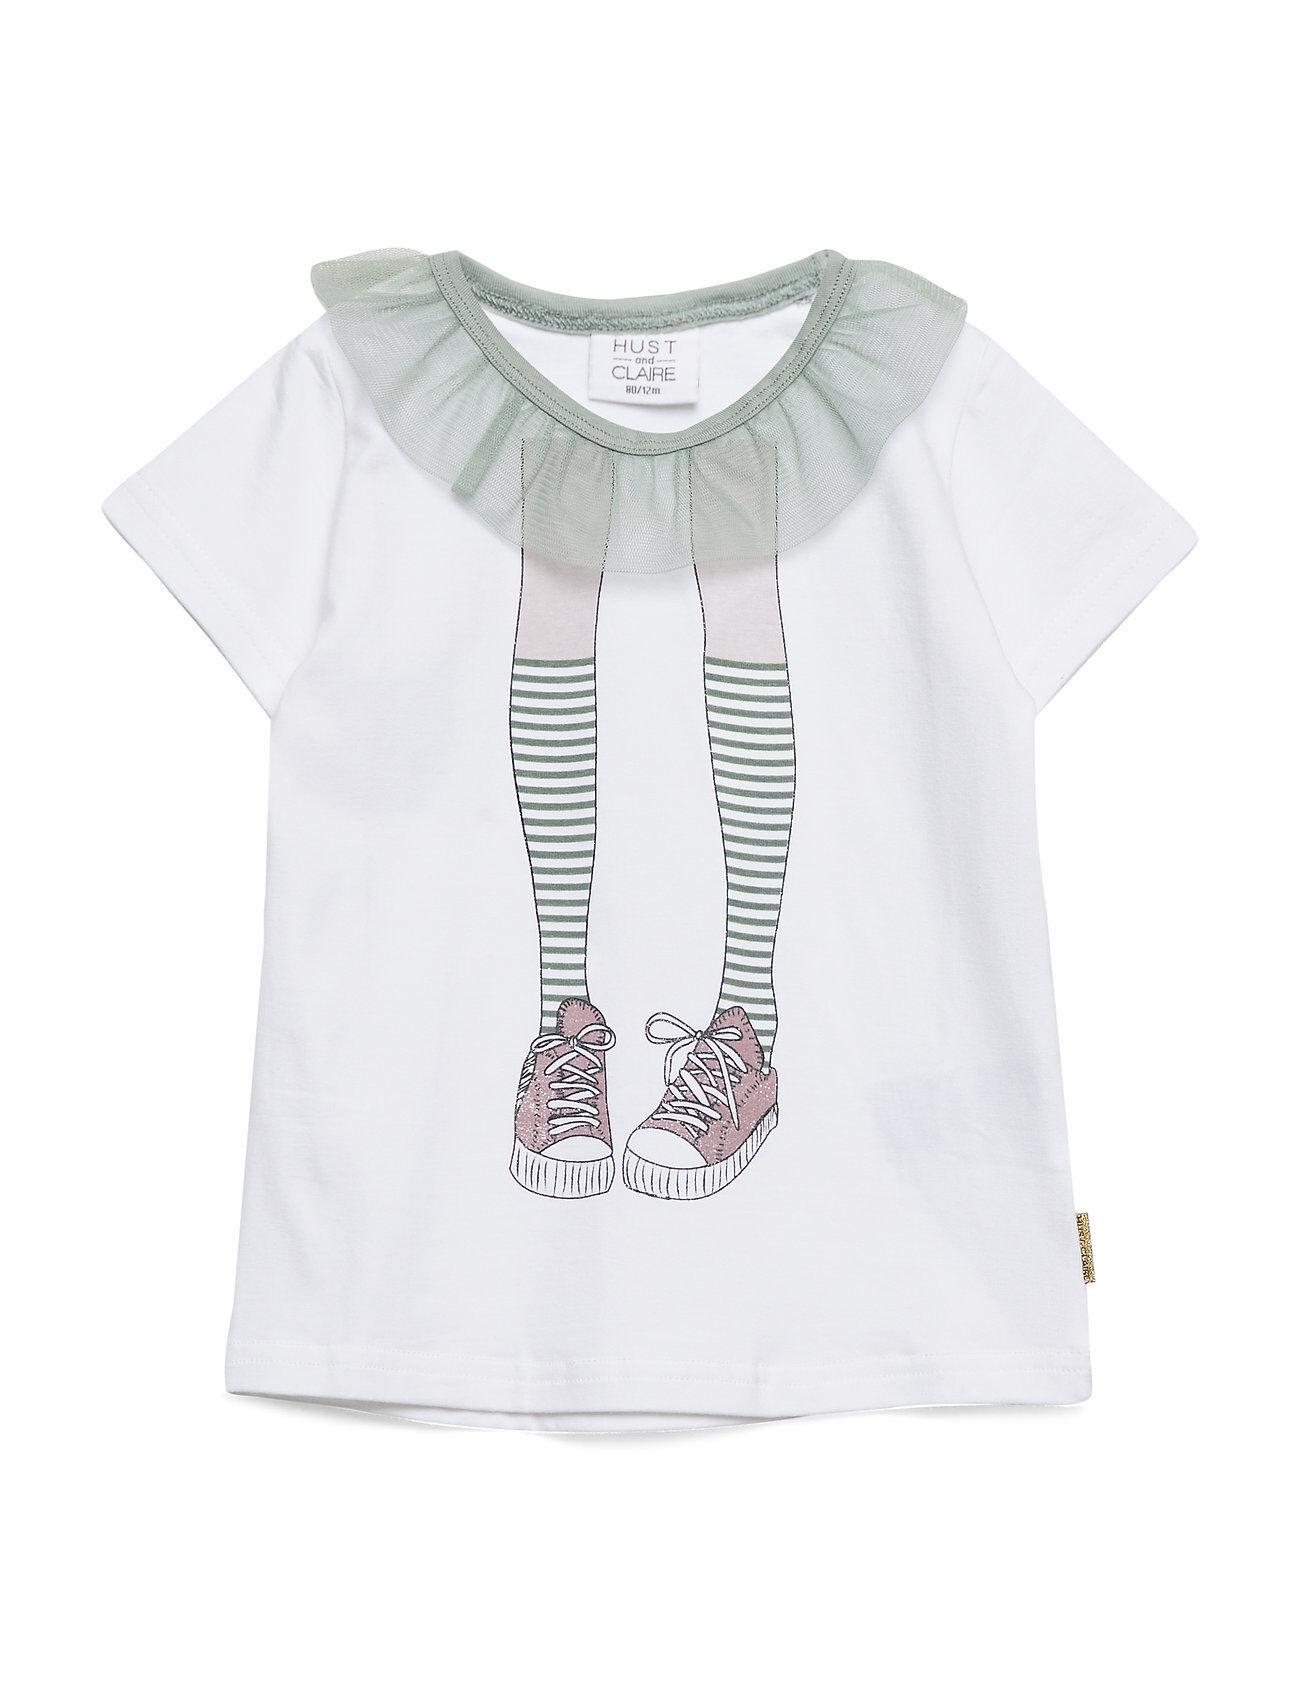 Hust & Claire Audrey - T-Shirt S/S T-shirts Short-sleeved Valkoinen Hust & Claire